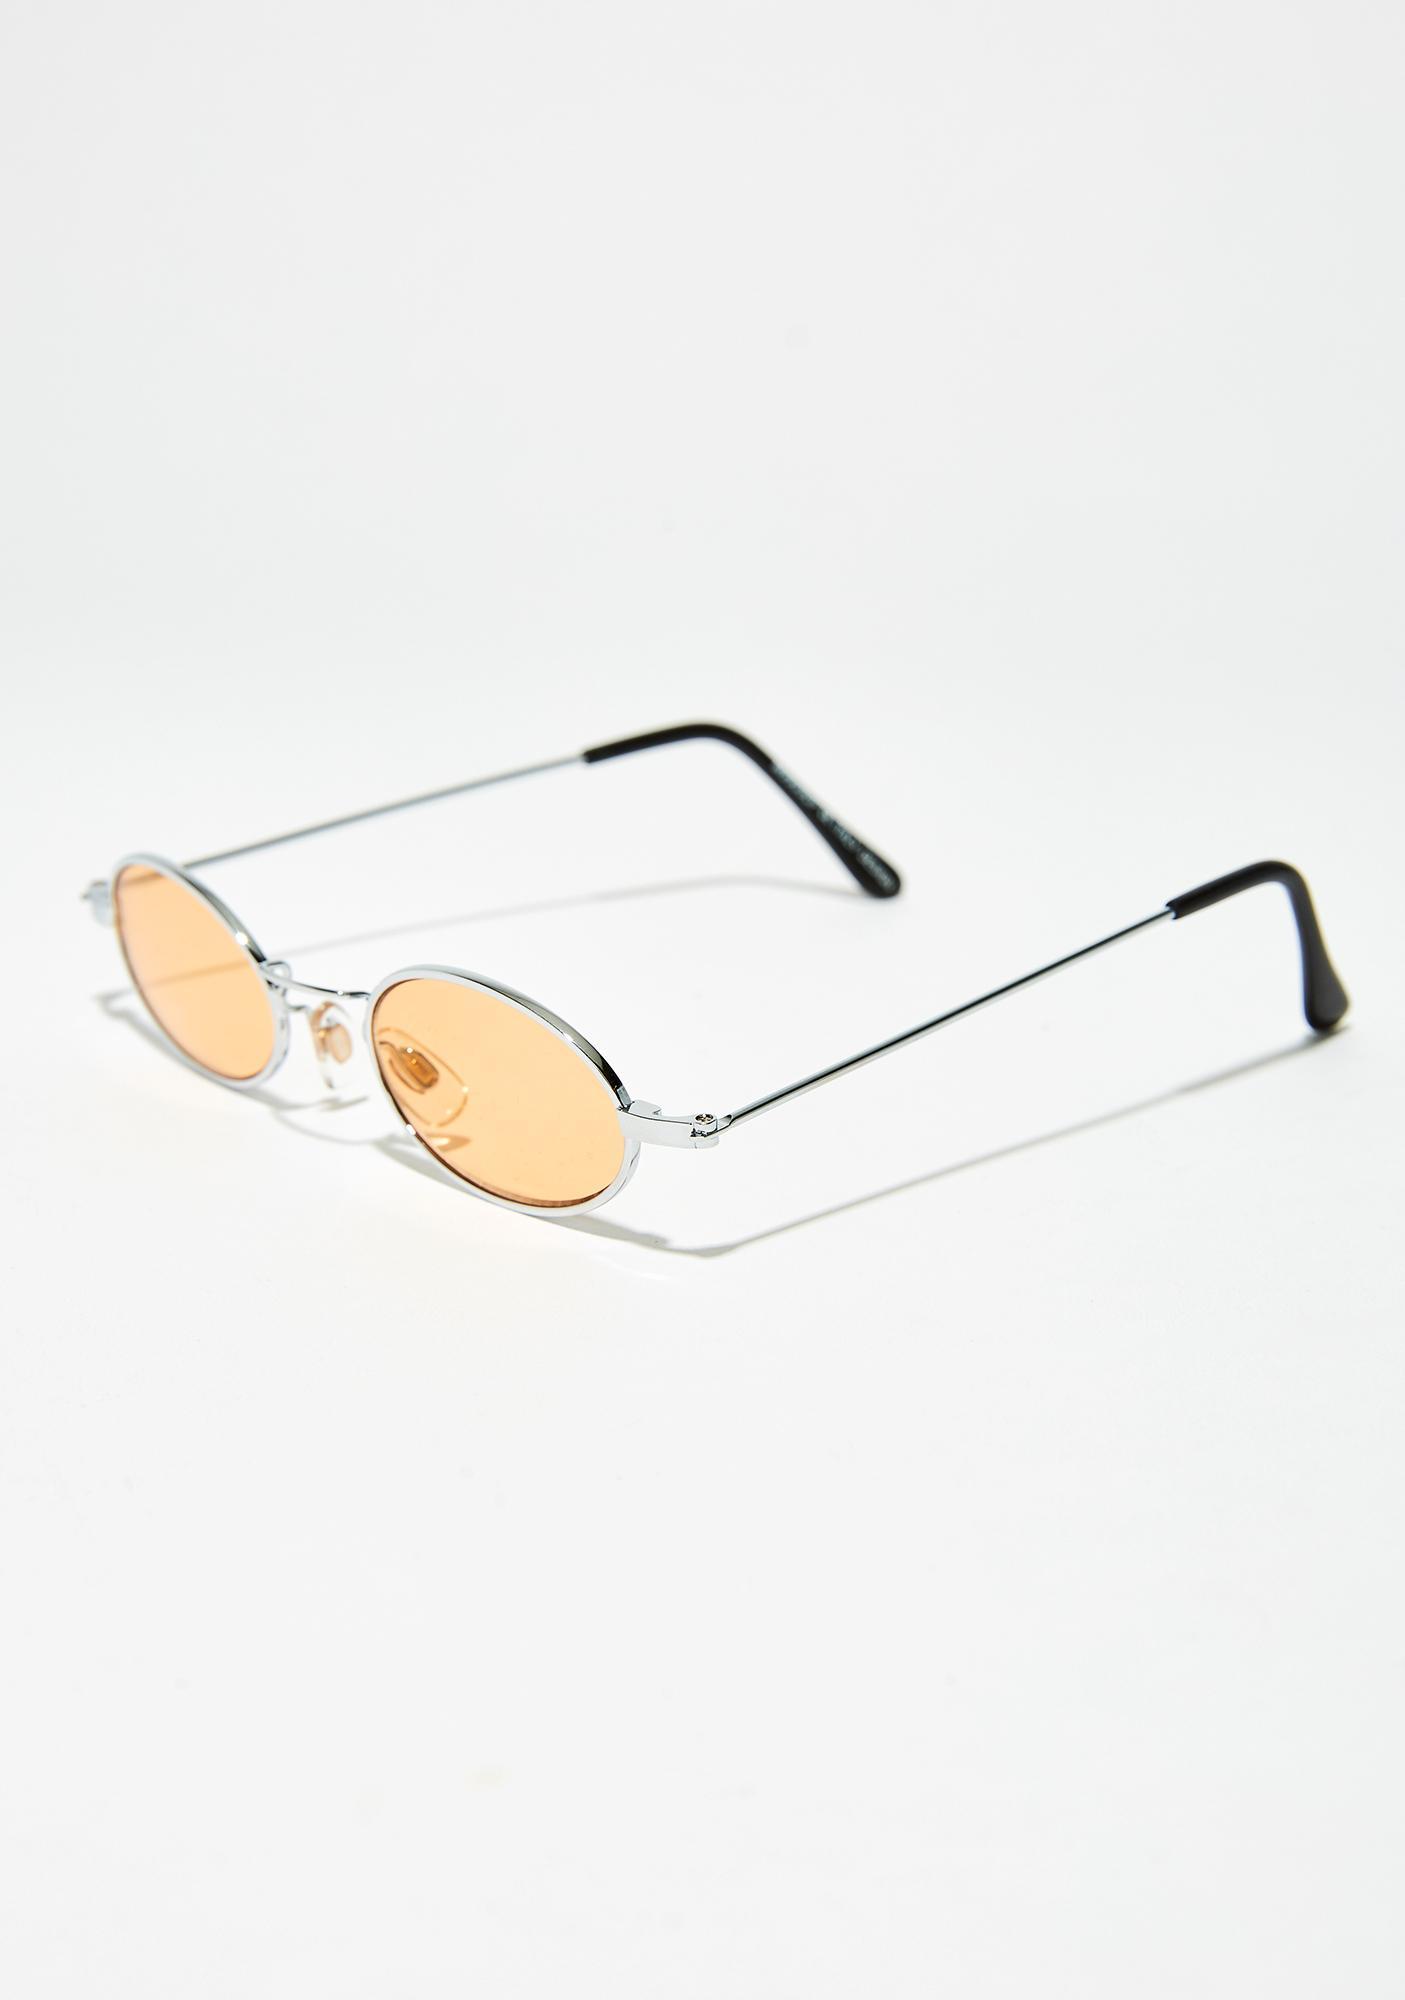 Beach Side Eye Lewks Round Sunglasses